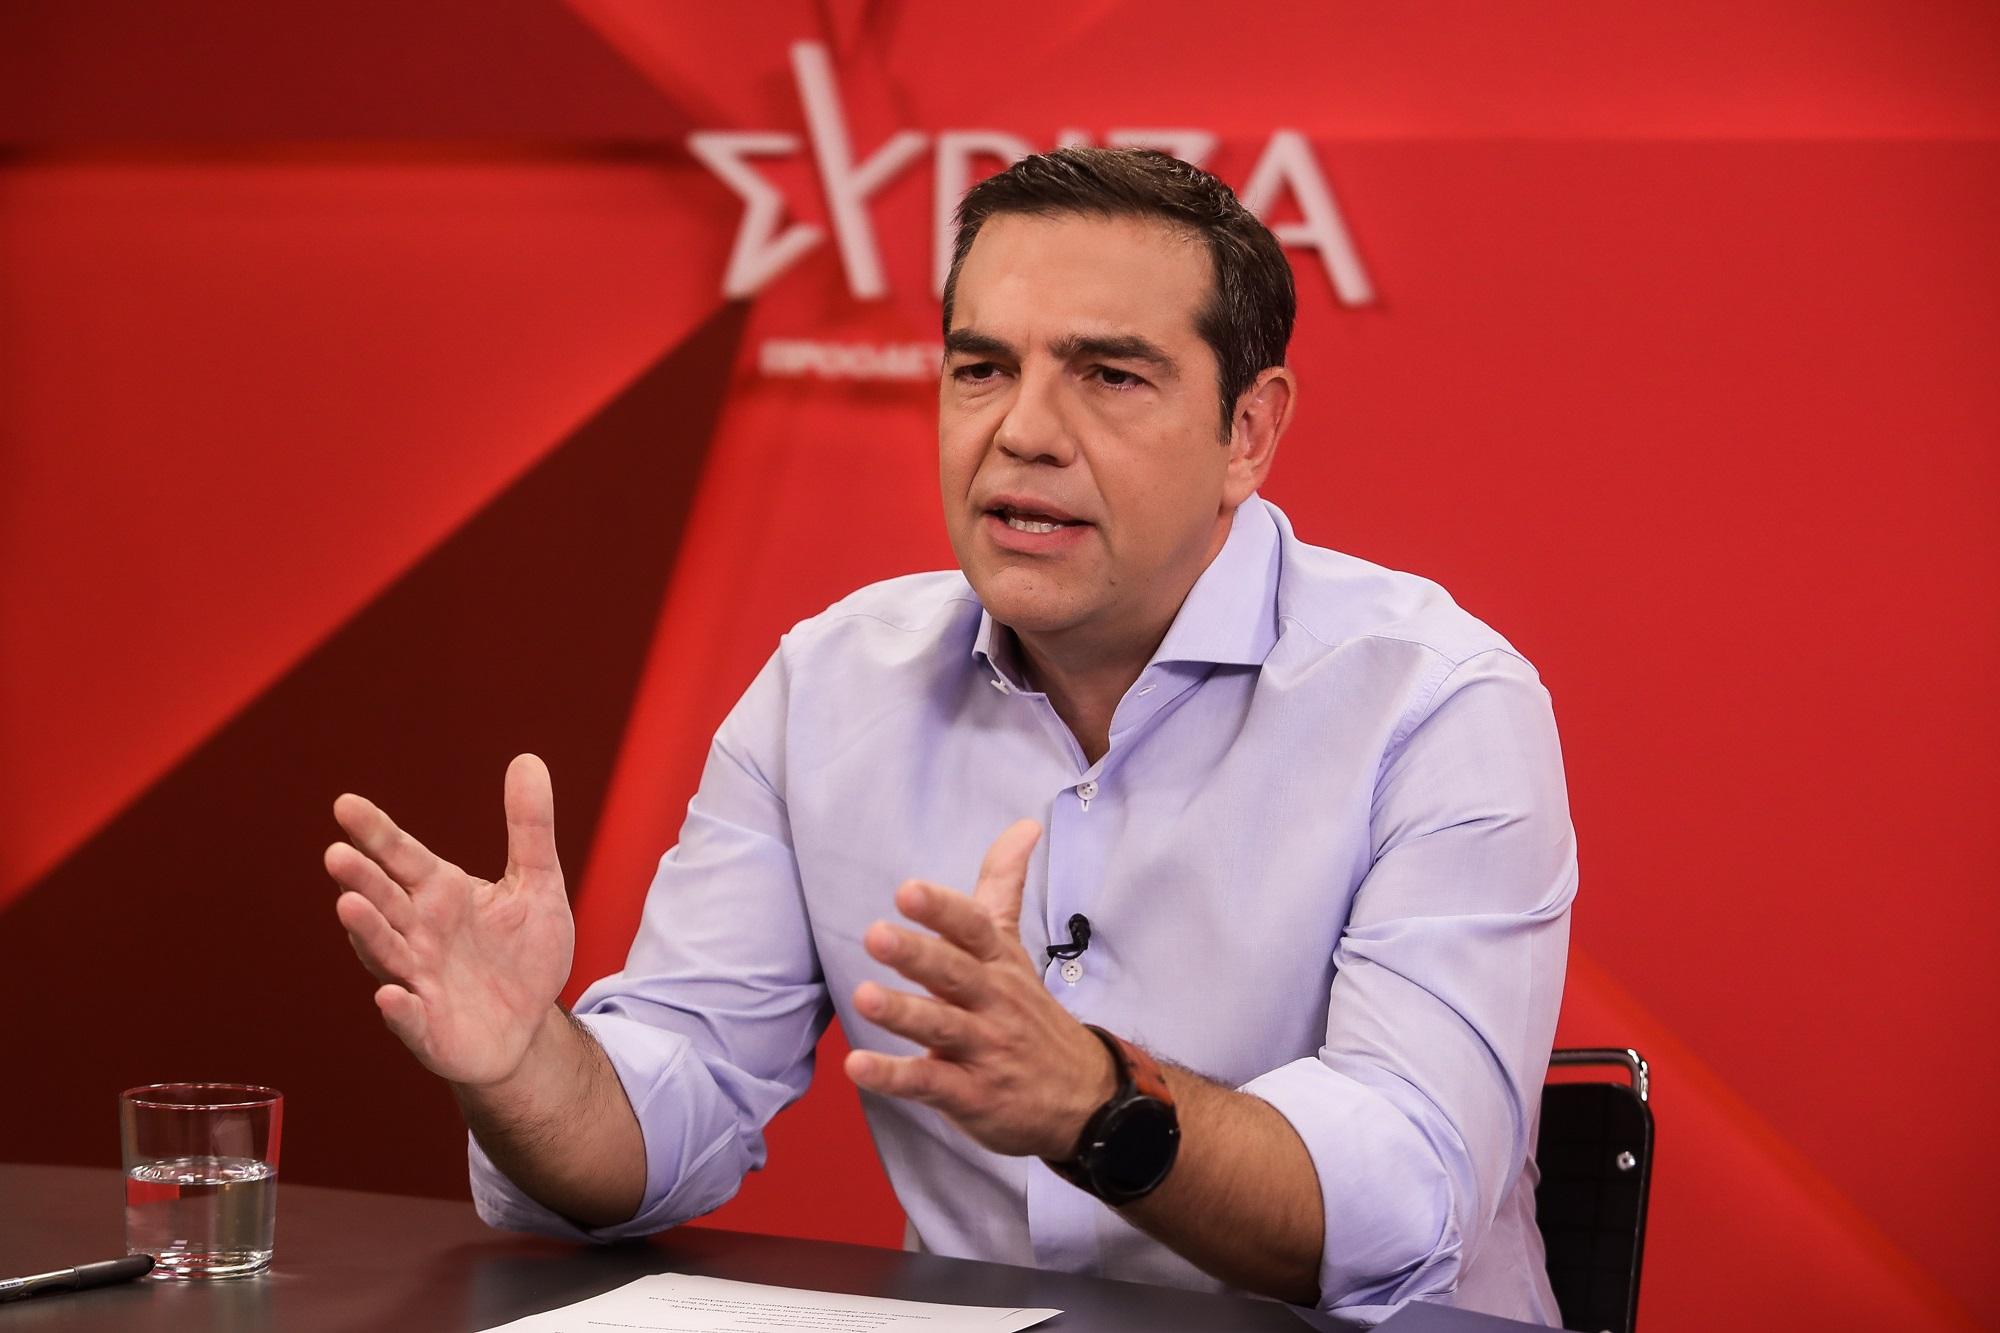 K. Mητσοτάκης στο Reuters: Είμαι πεπεισμένος ότι η ανάκαμψη θα είναι βιώσιμη και δίκαιη